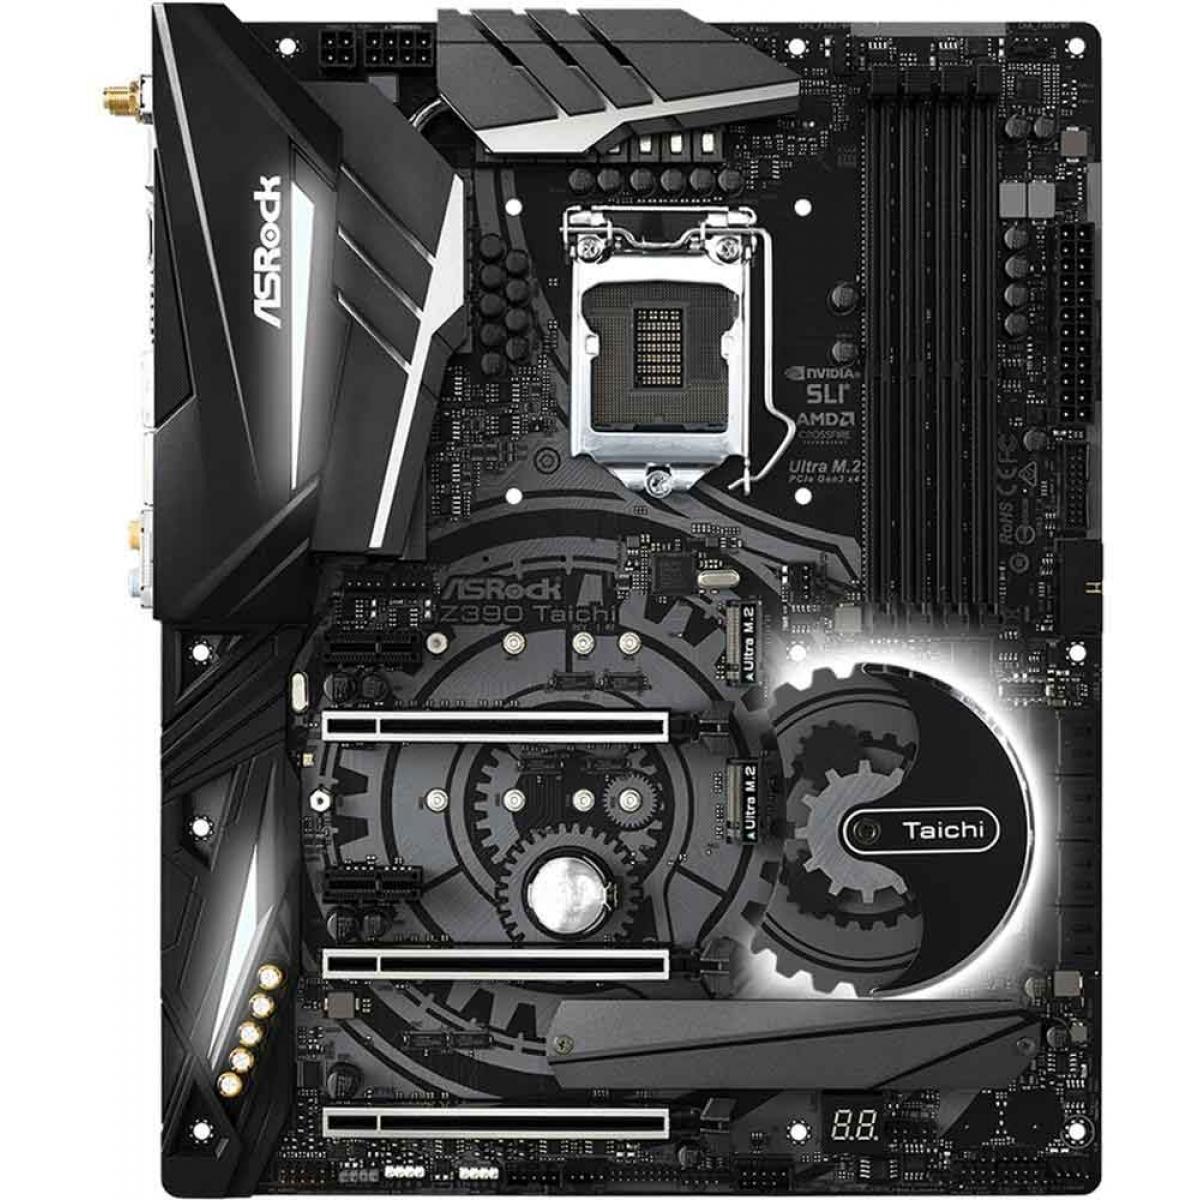 Placa Mãe ASRock Z390 Taichi Wifi, Chipset Z390, Intel LGA 1151, ATX, DDR4